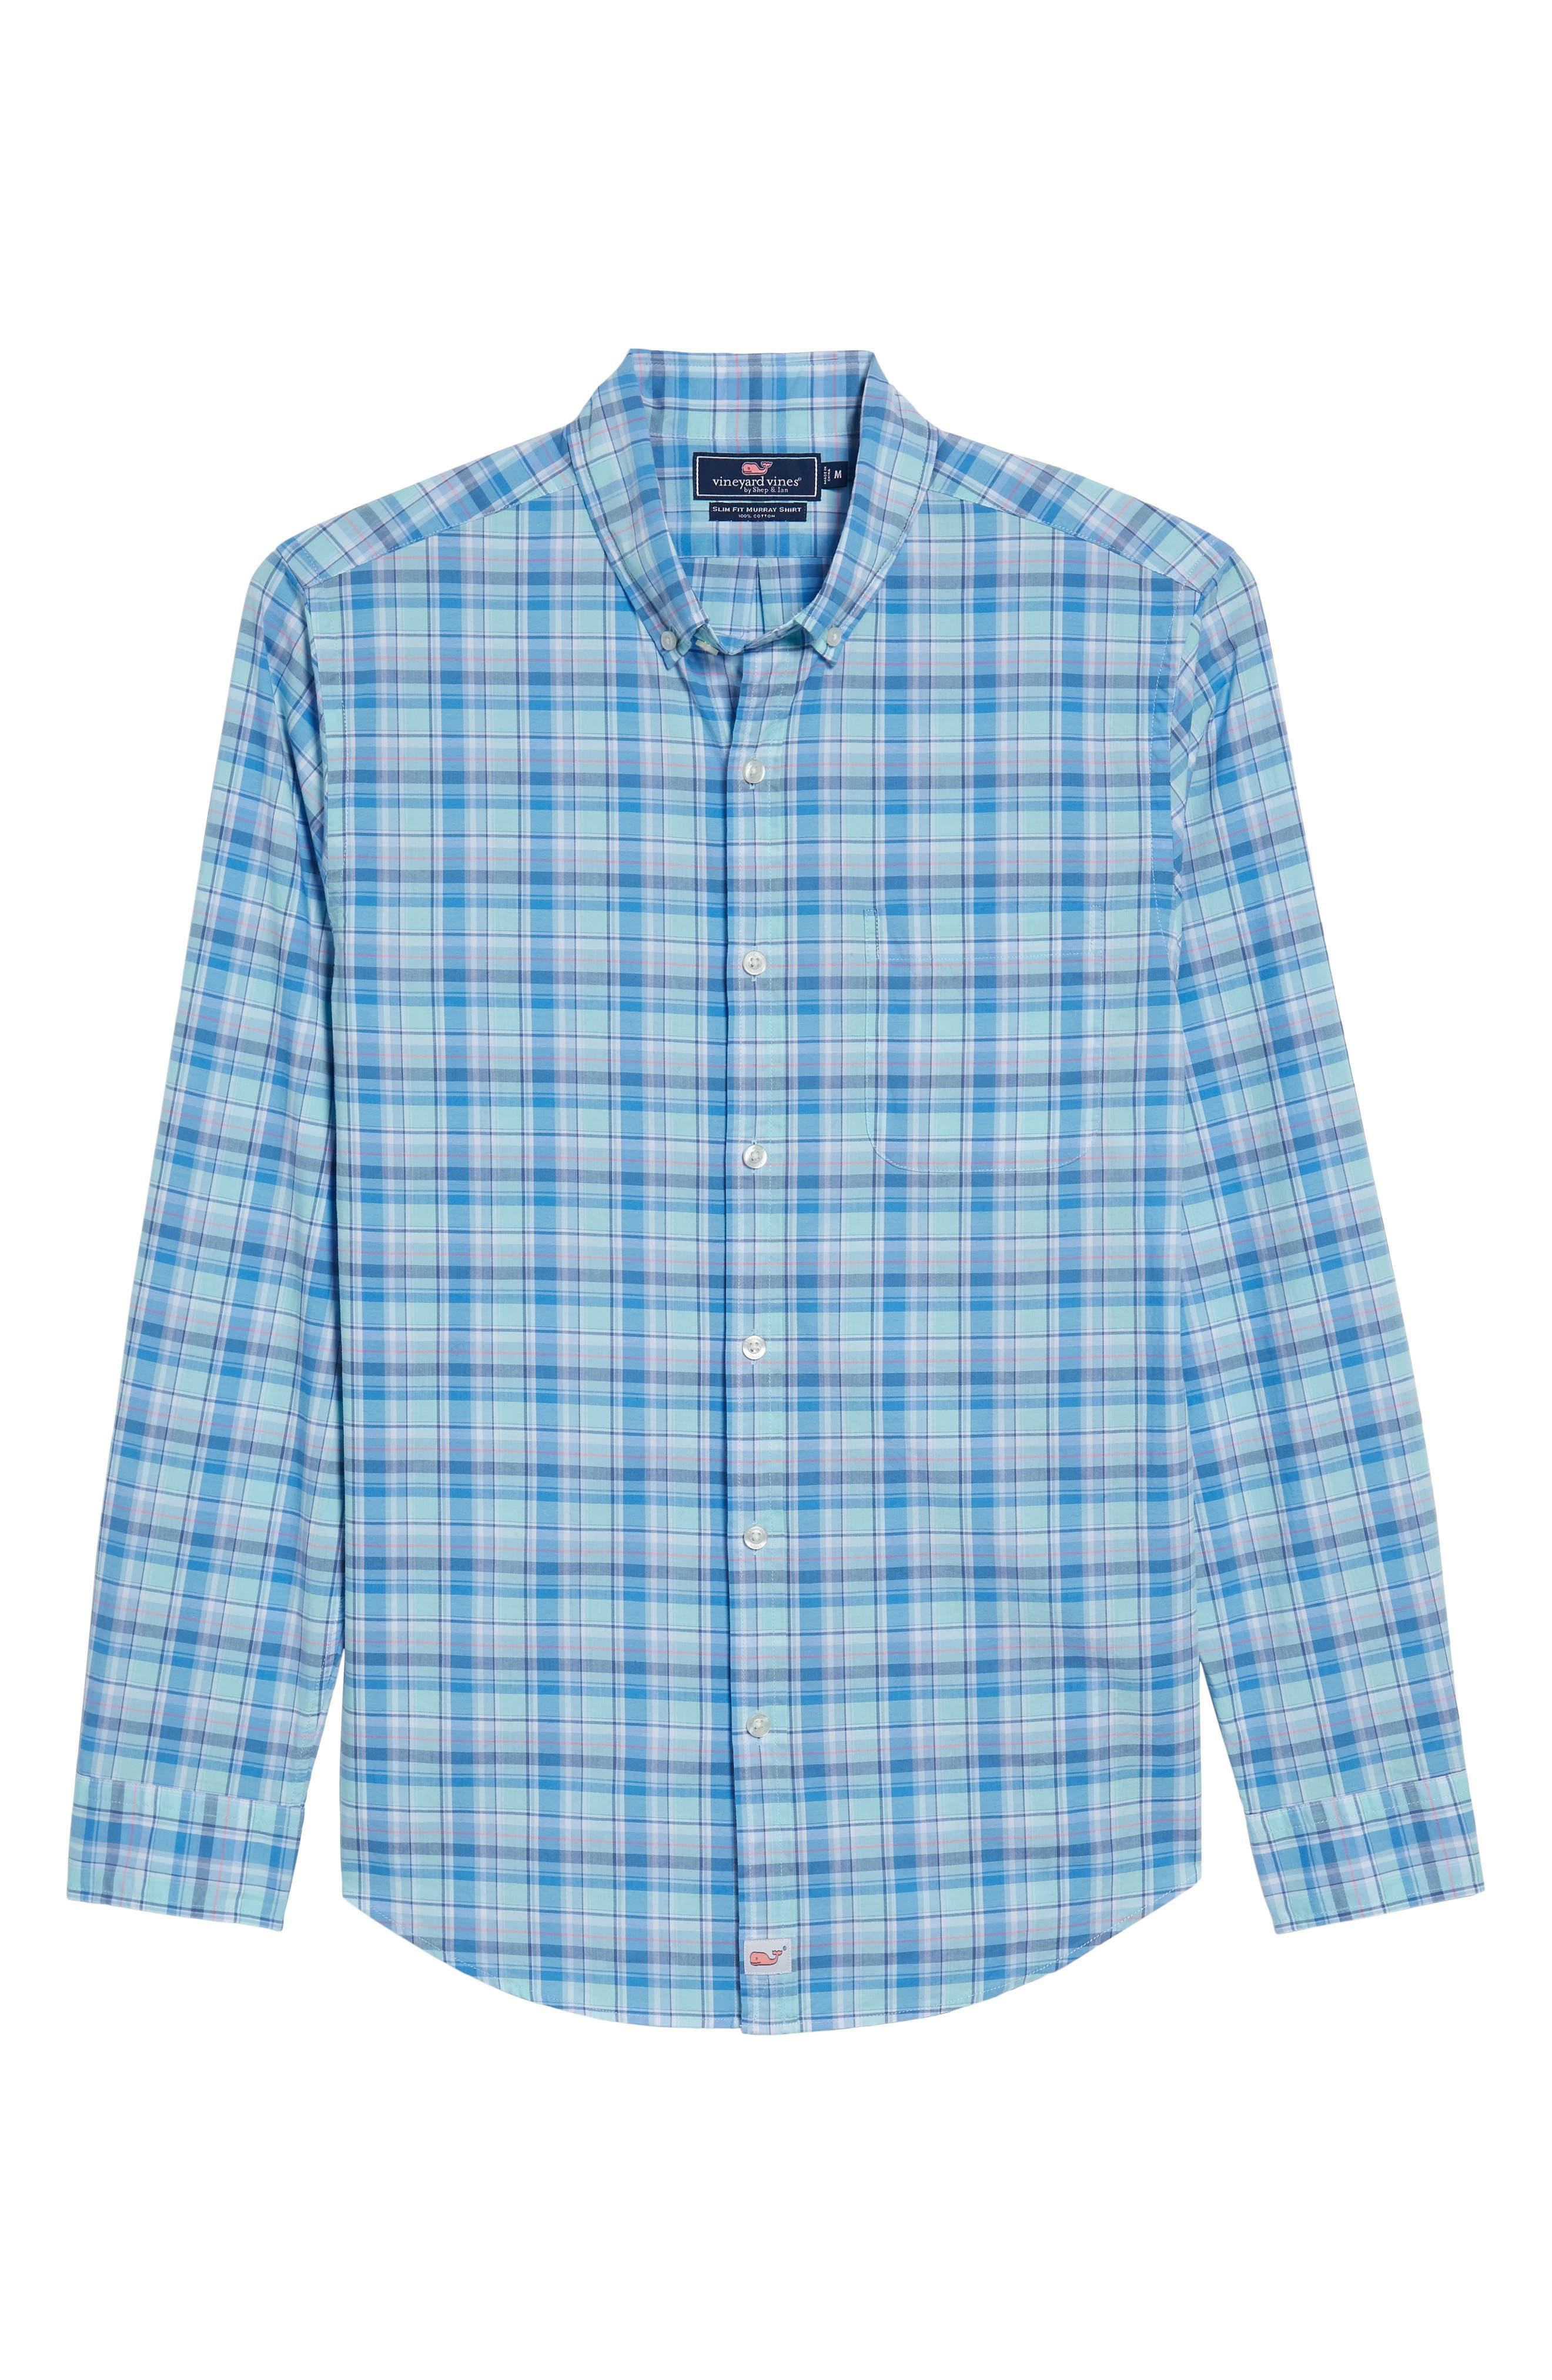 Murray Pine Island Slim Fit Plaid Sport Shirt,                             Alternate thumbnail 6, color,                             422